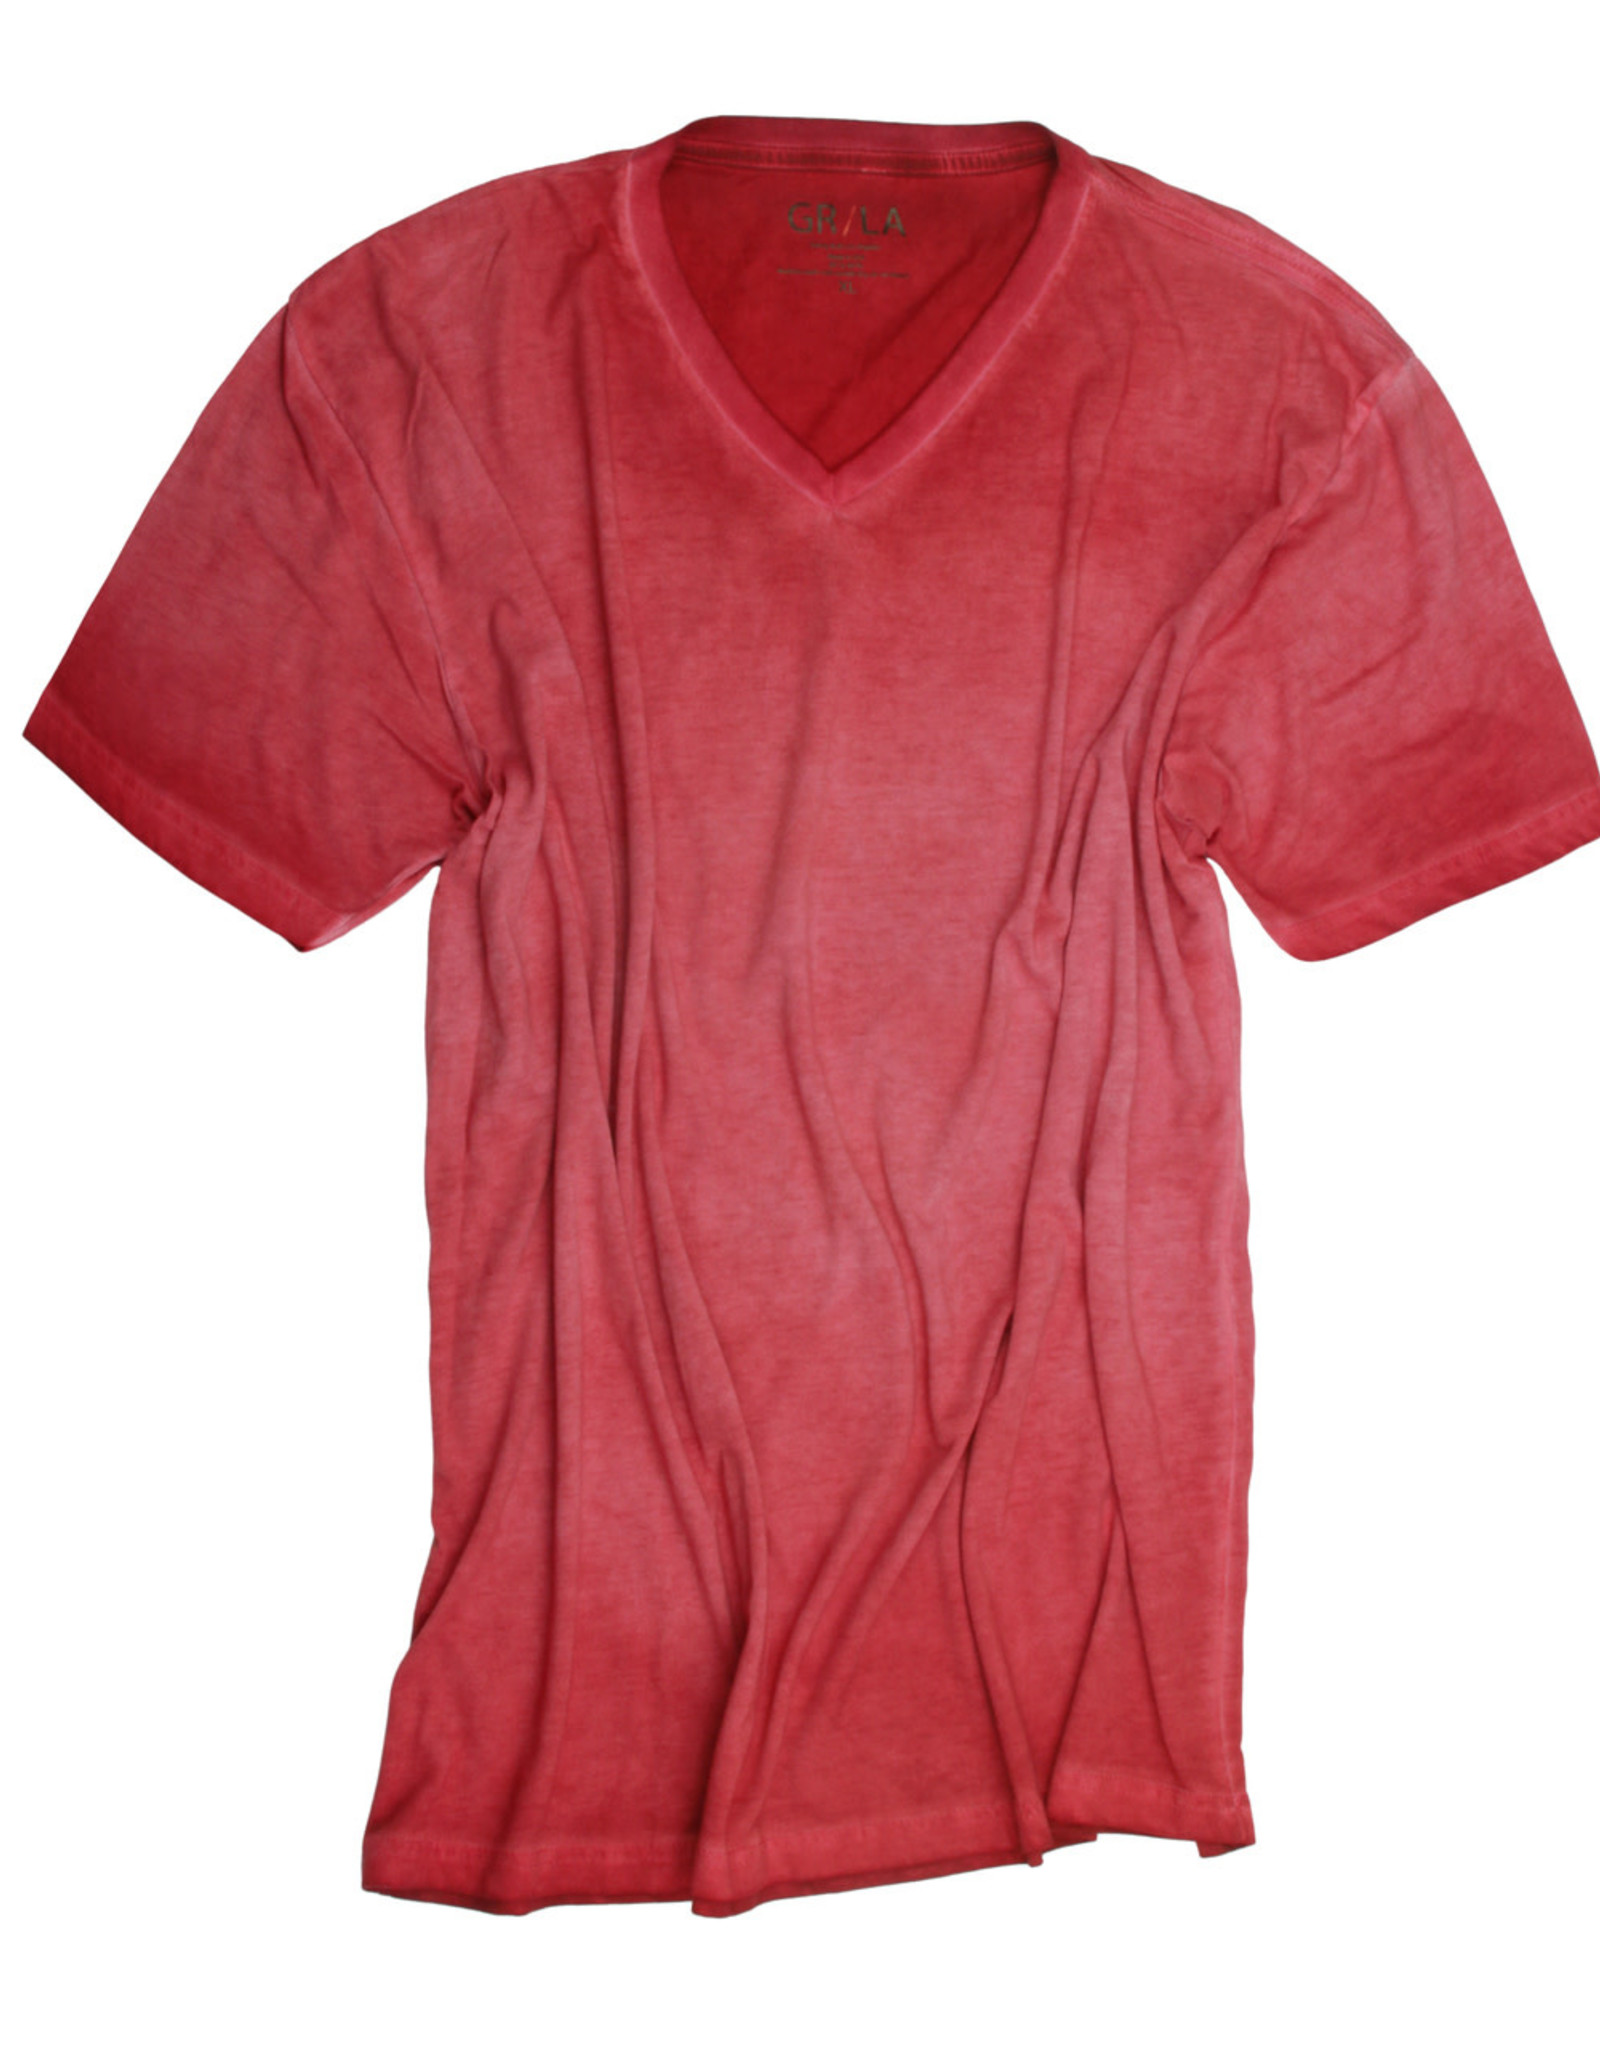 Georg Roth V-Neck S/S T-Shirt